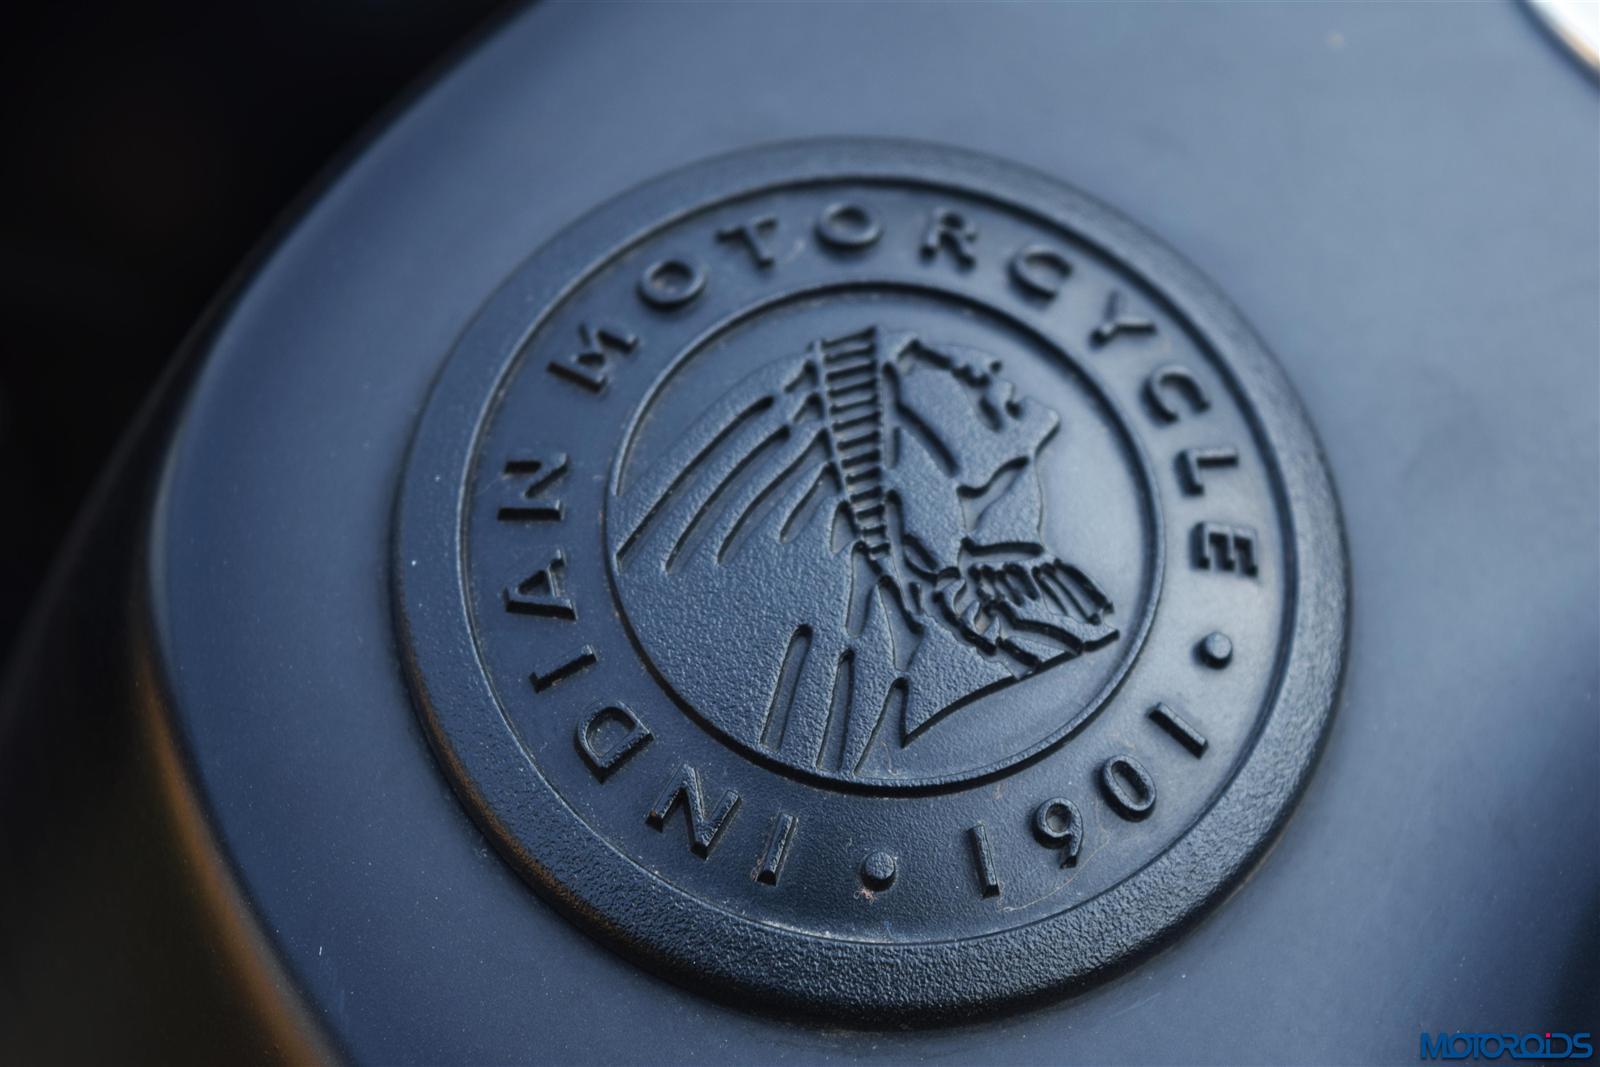 Indian Dark Horse logo on fuel tank (35)